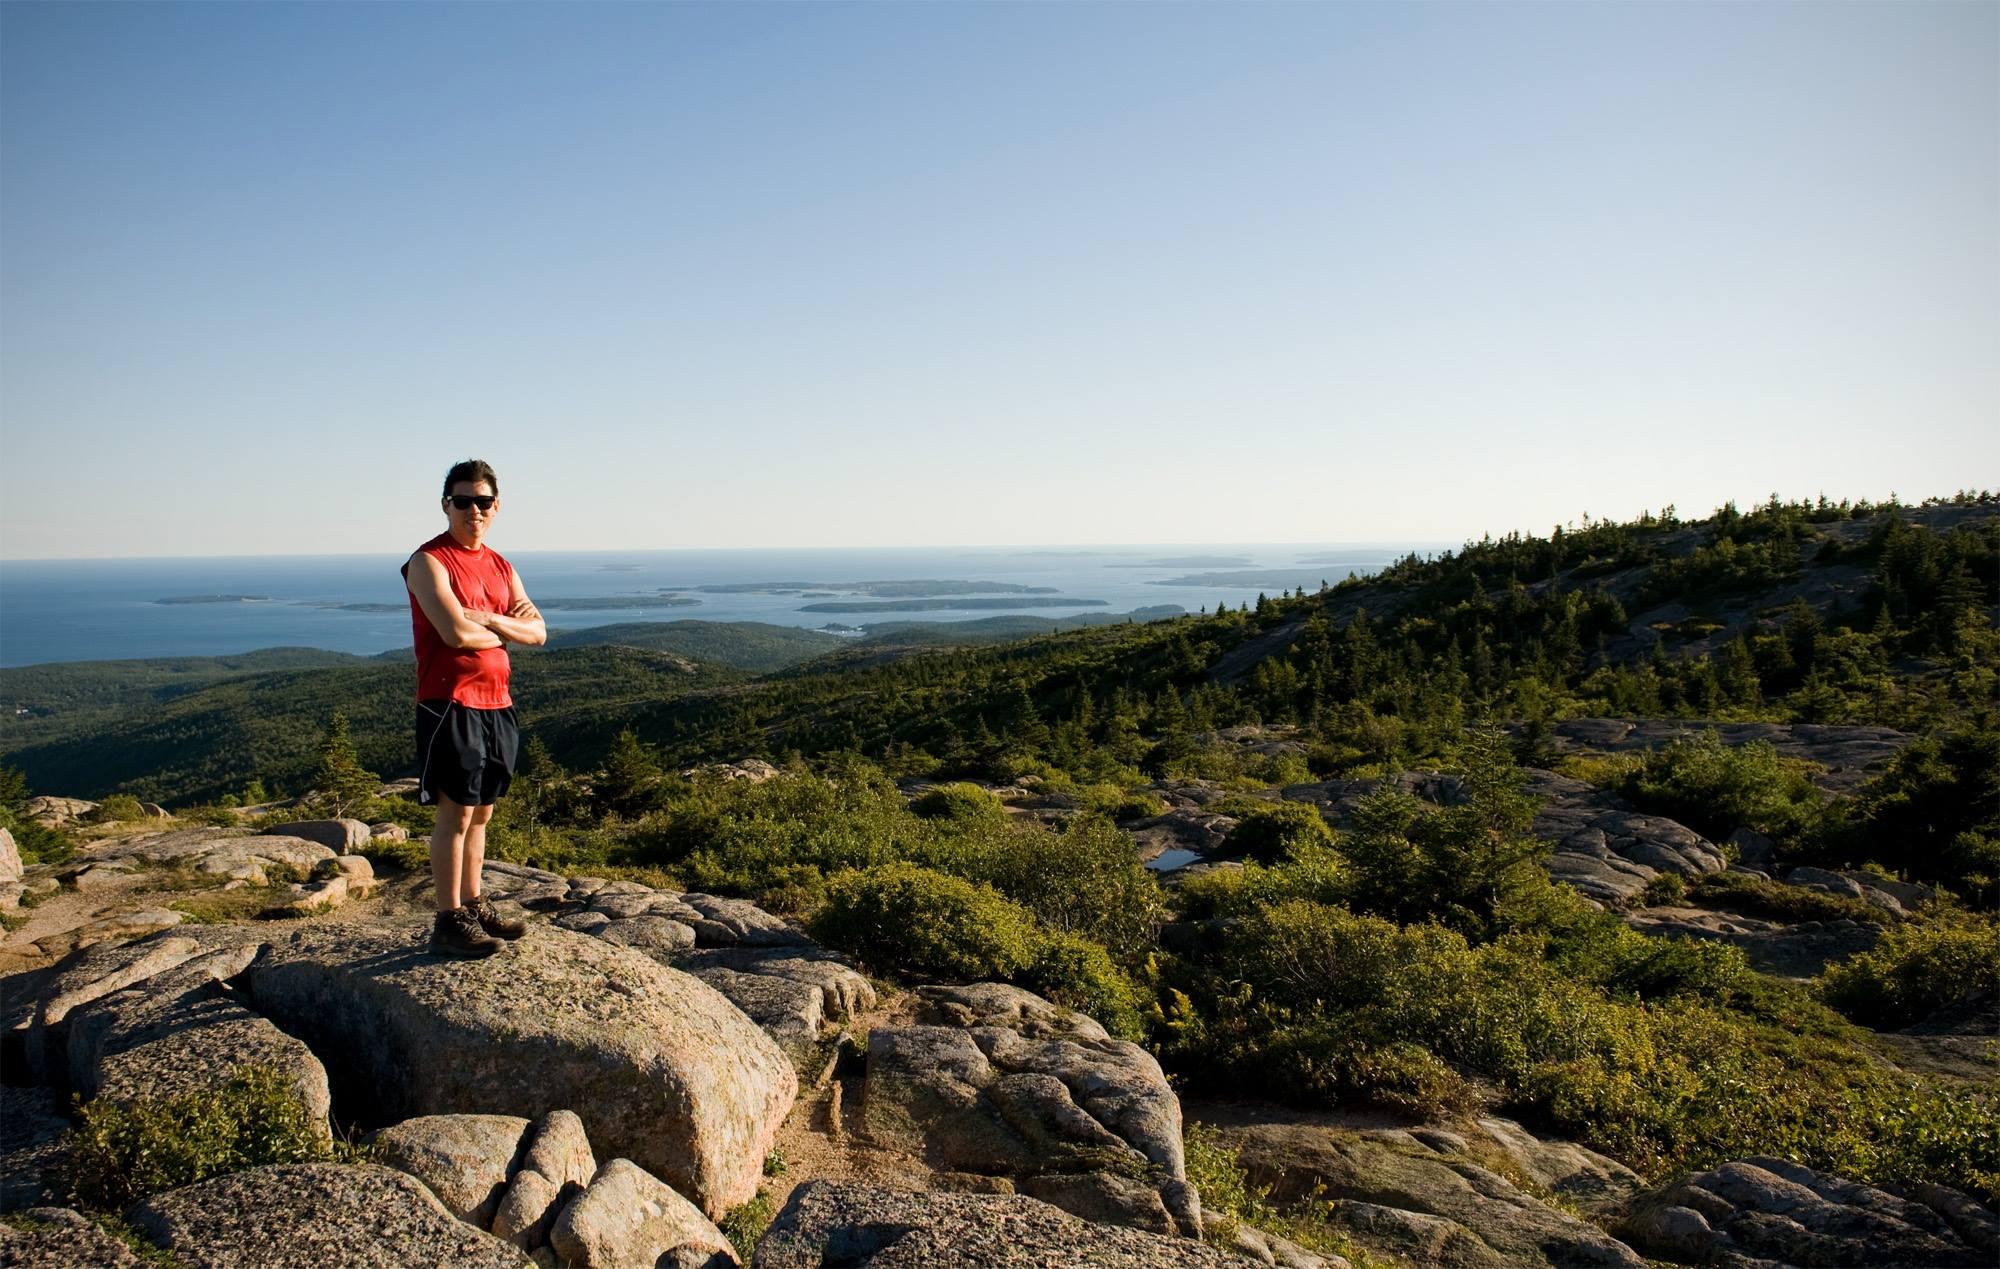 Credit cards enable worldwide travel (Acadia National Park, 2014  ©  JOEL ANG PHOTOGRAPHY)